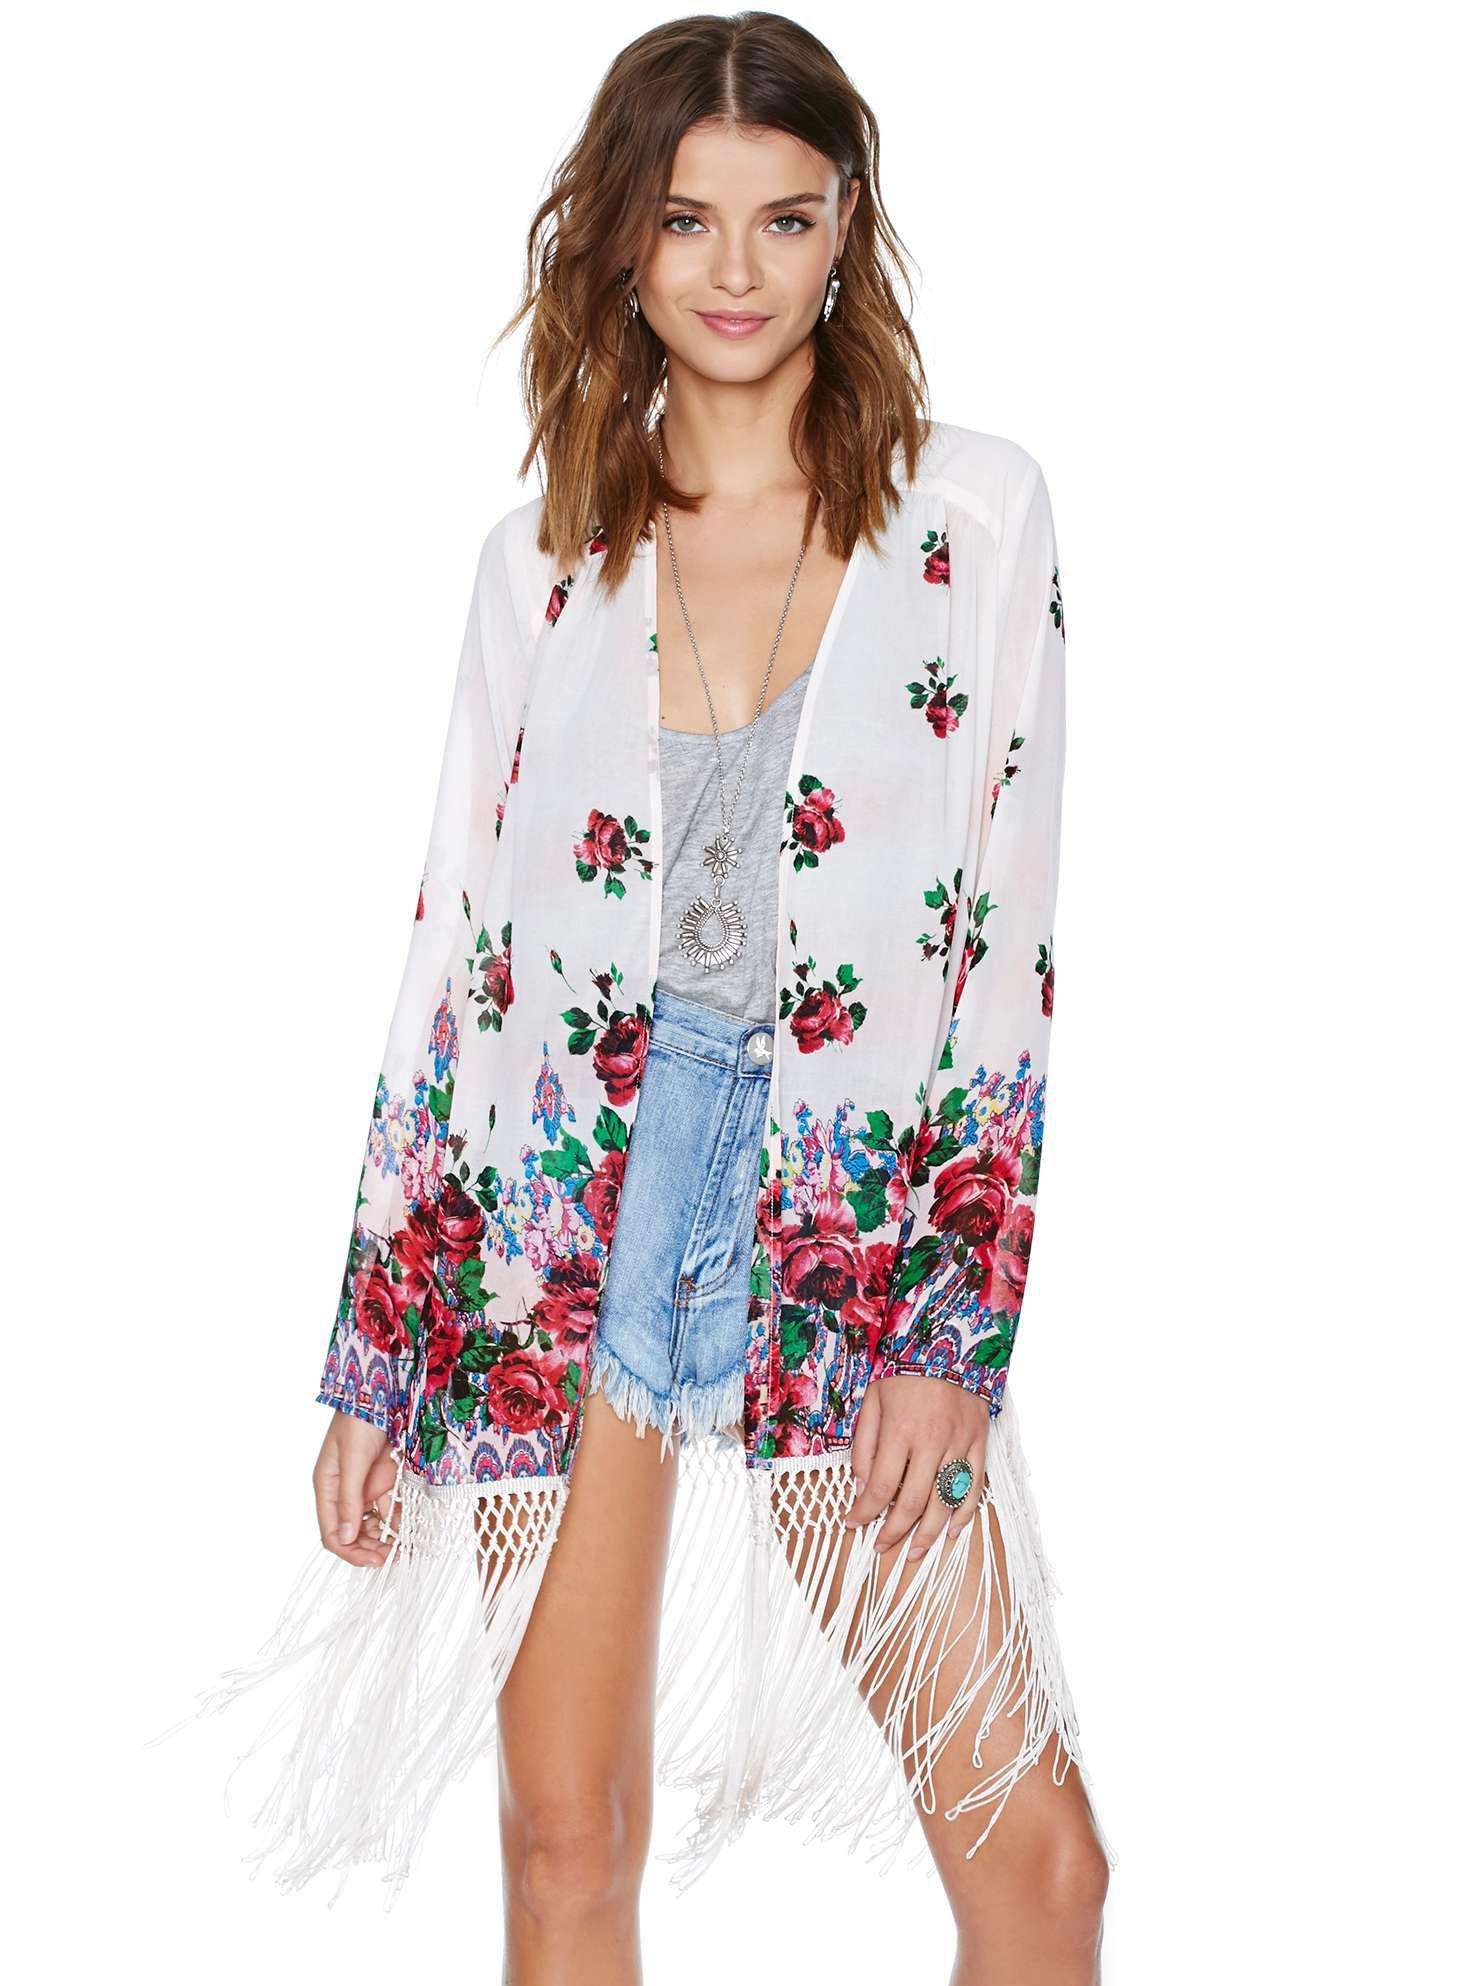 Floral Tassel Blouse | college lookbook ʕ •́؈•̀ ₎ | Pinterest ...